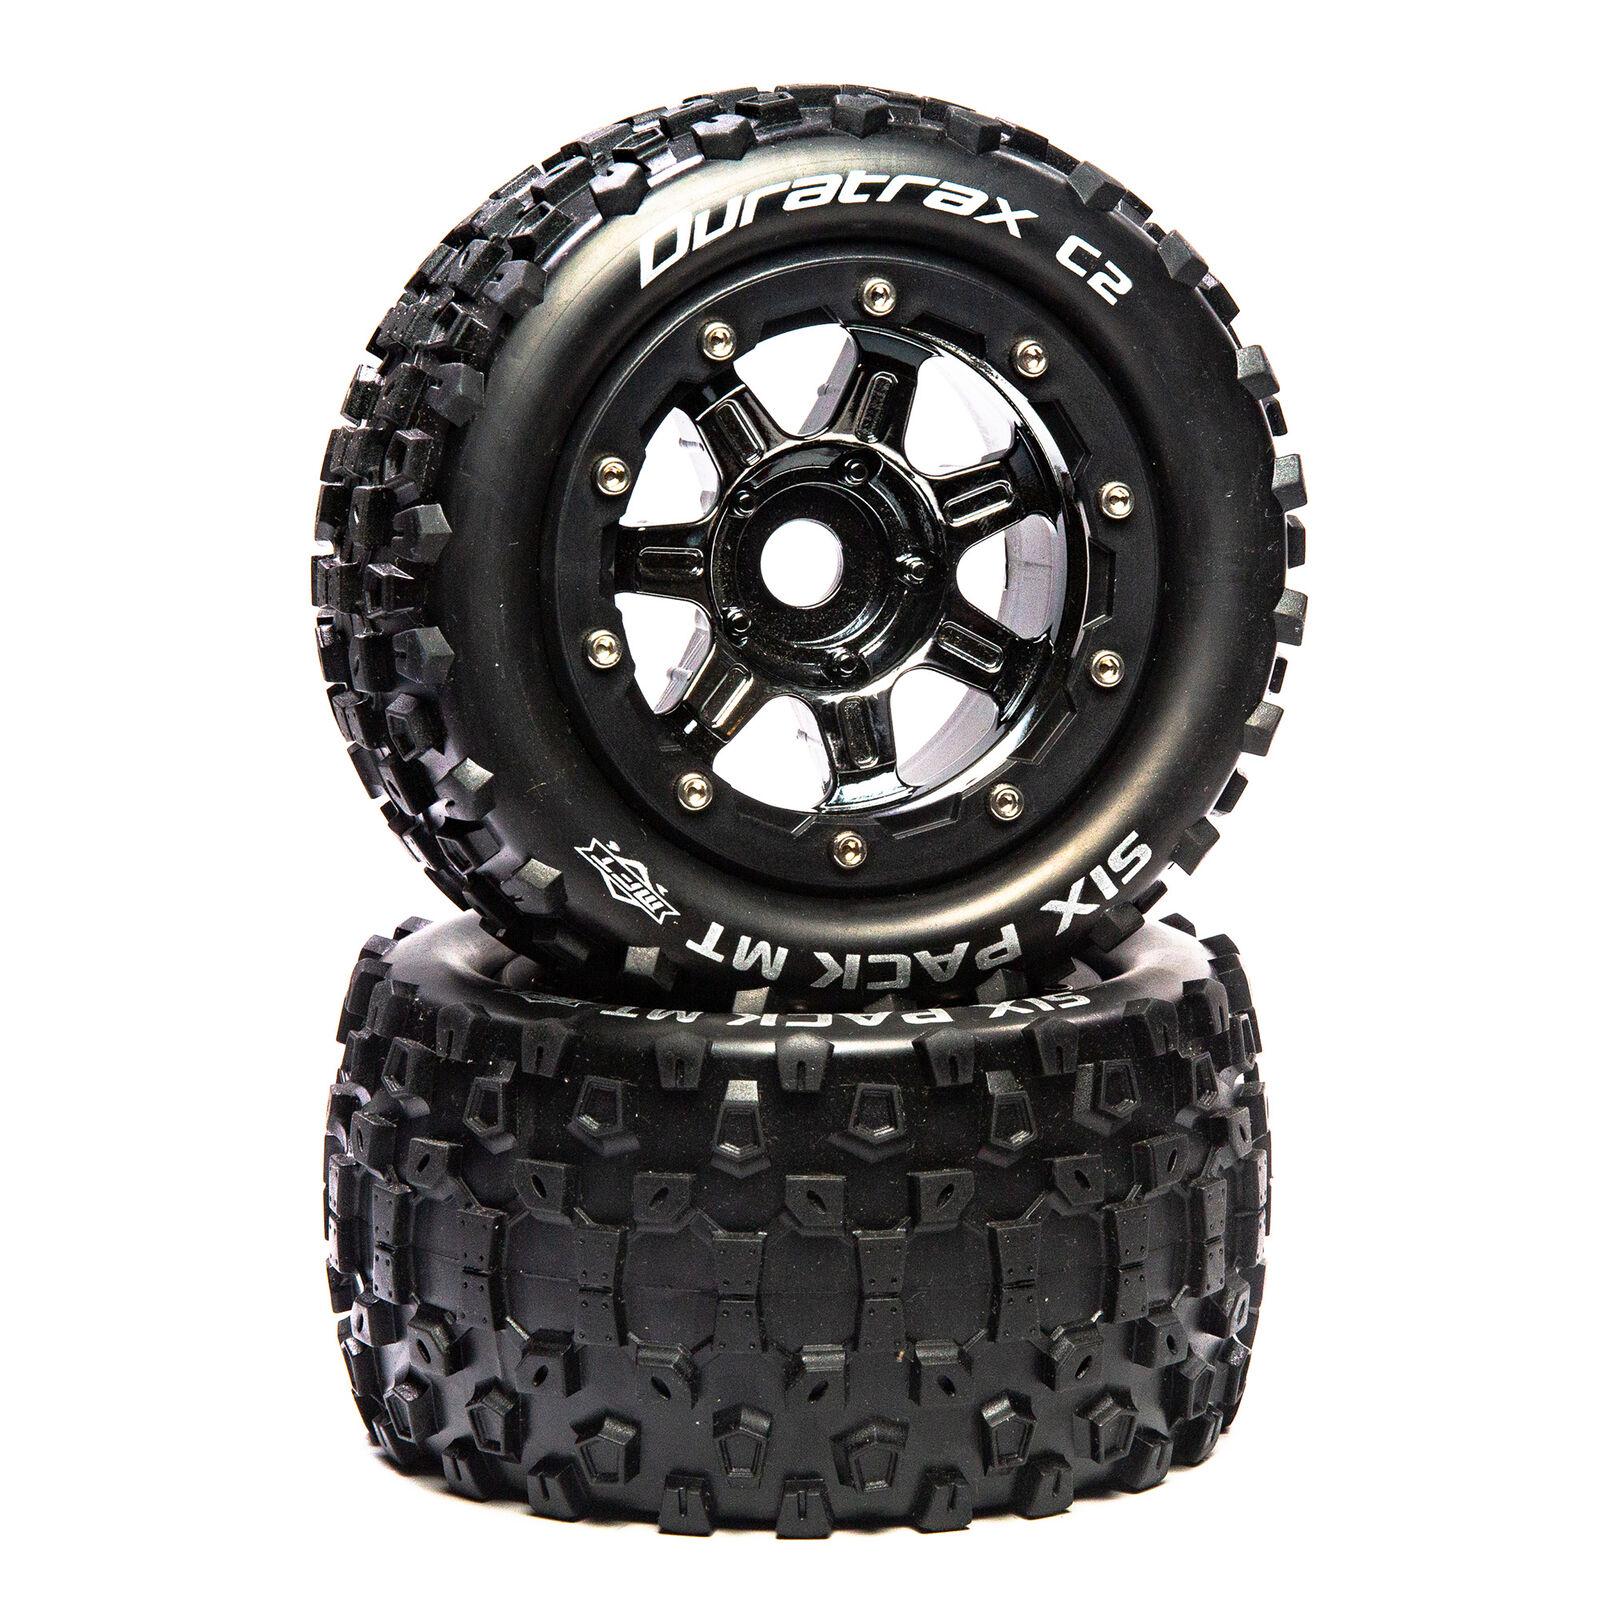 "SixPack MT Belt 2.8"" Mounted Front/Rear Tires .5 Offset 17mm, Black Chrome (2)"